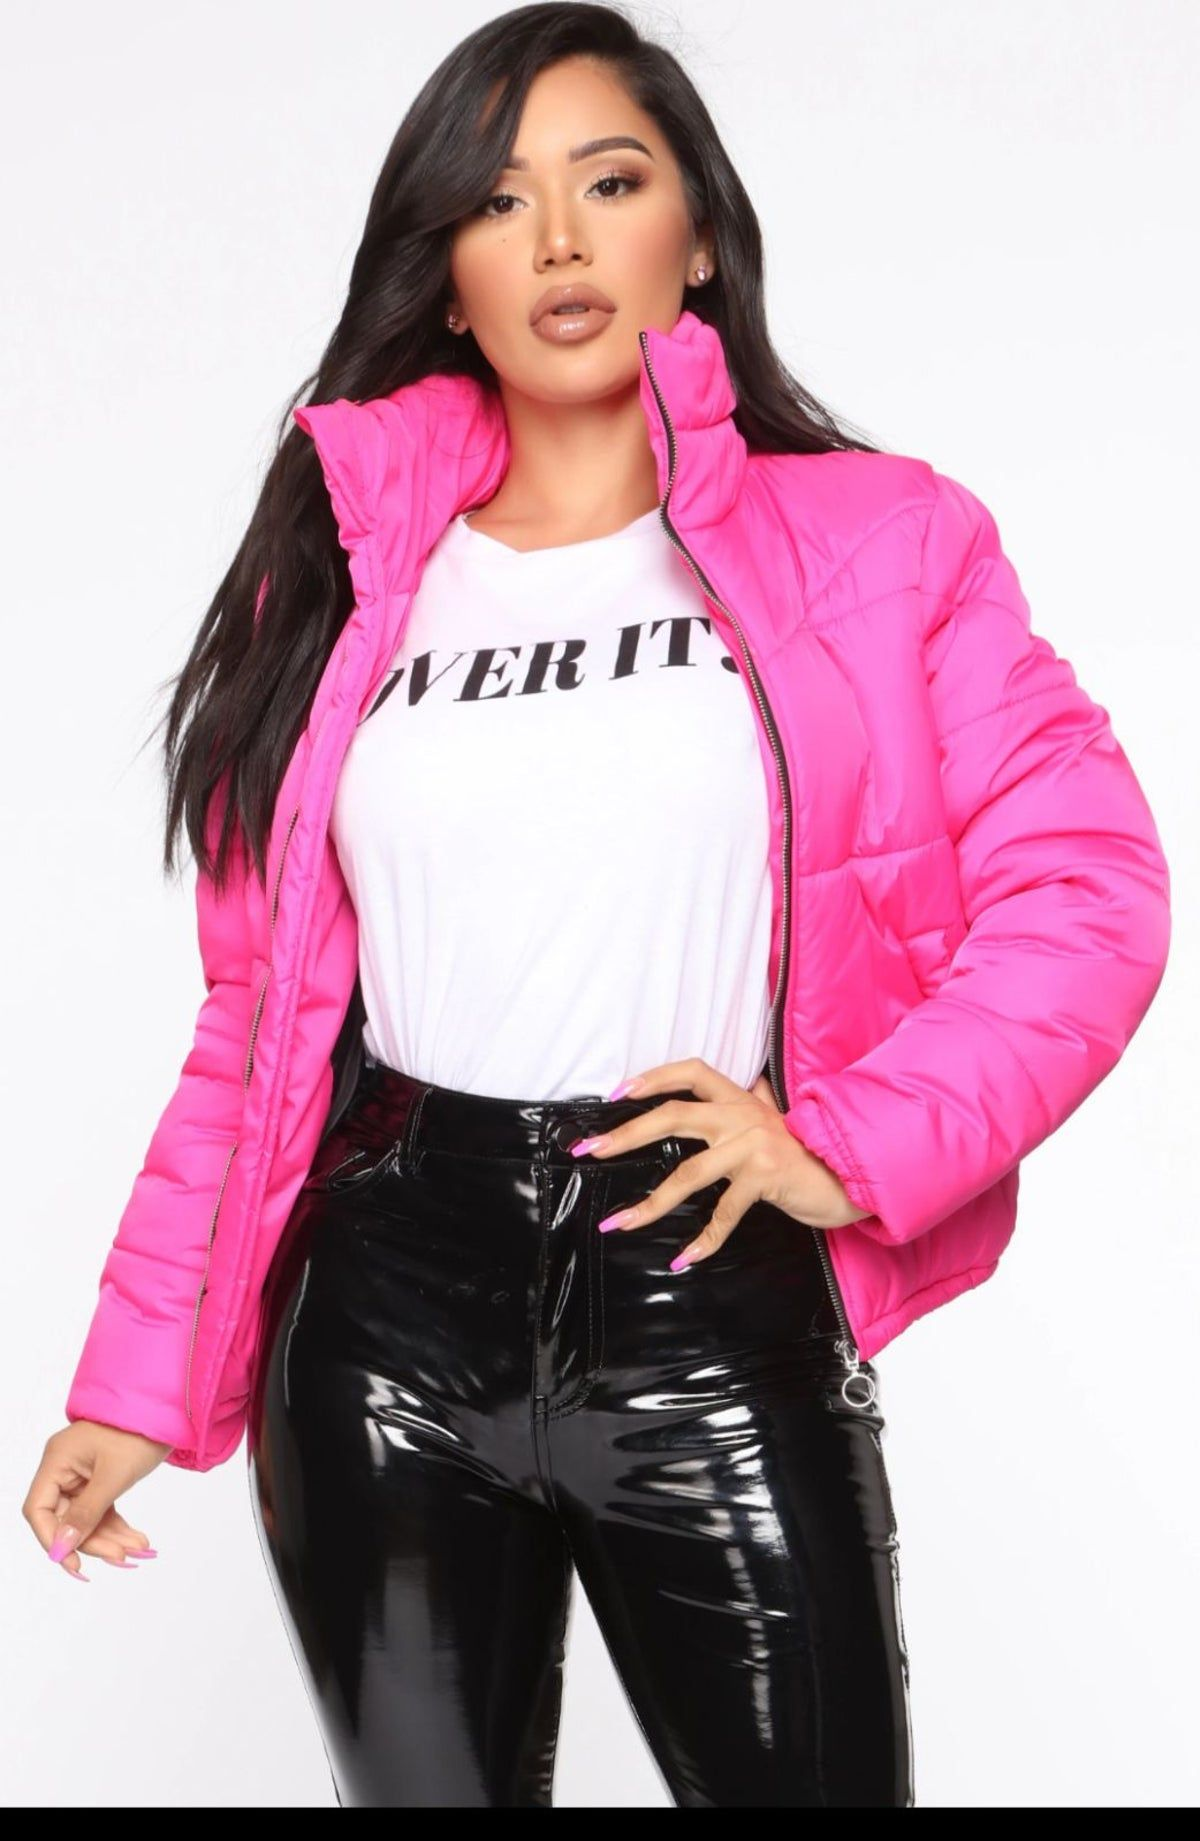 Fashion Nova Bubble Gum Pink Puffer Jack In 2021 Jacket Outfit Women Puffer Jacket Outfit Pink Puffer Jacket Outfit [ 1841 x 1200 Pixel ]